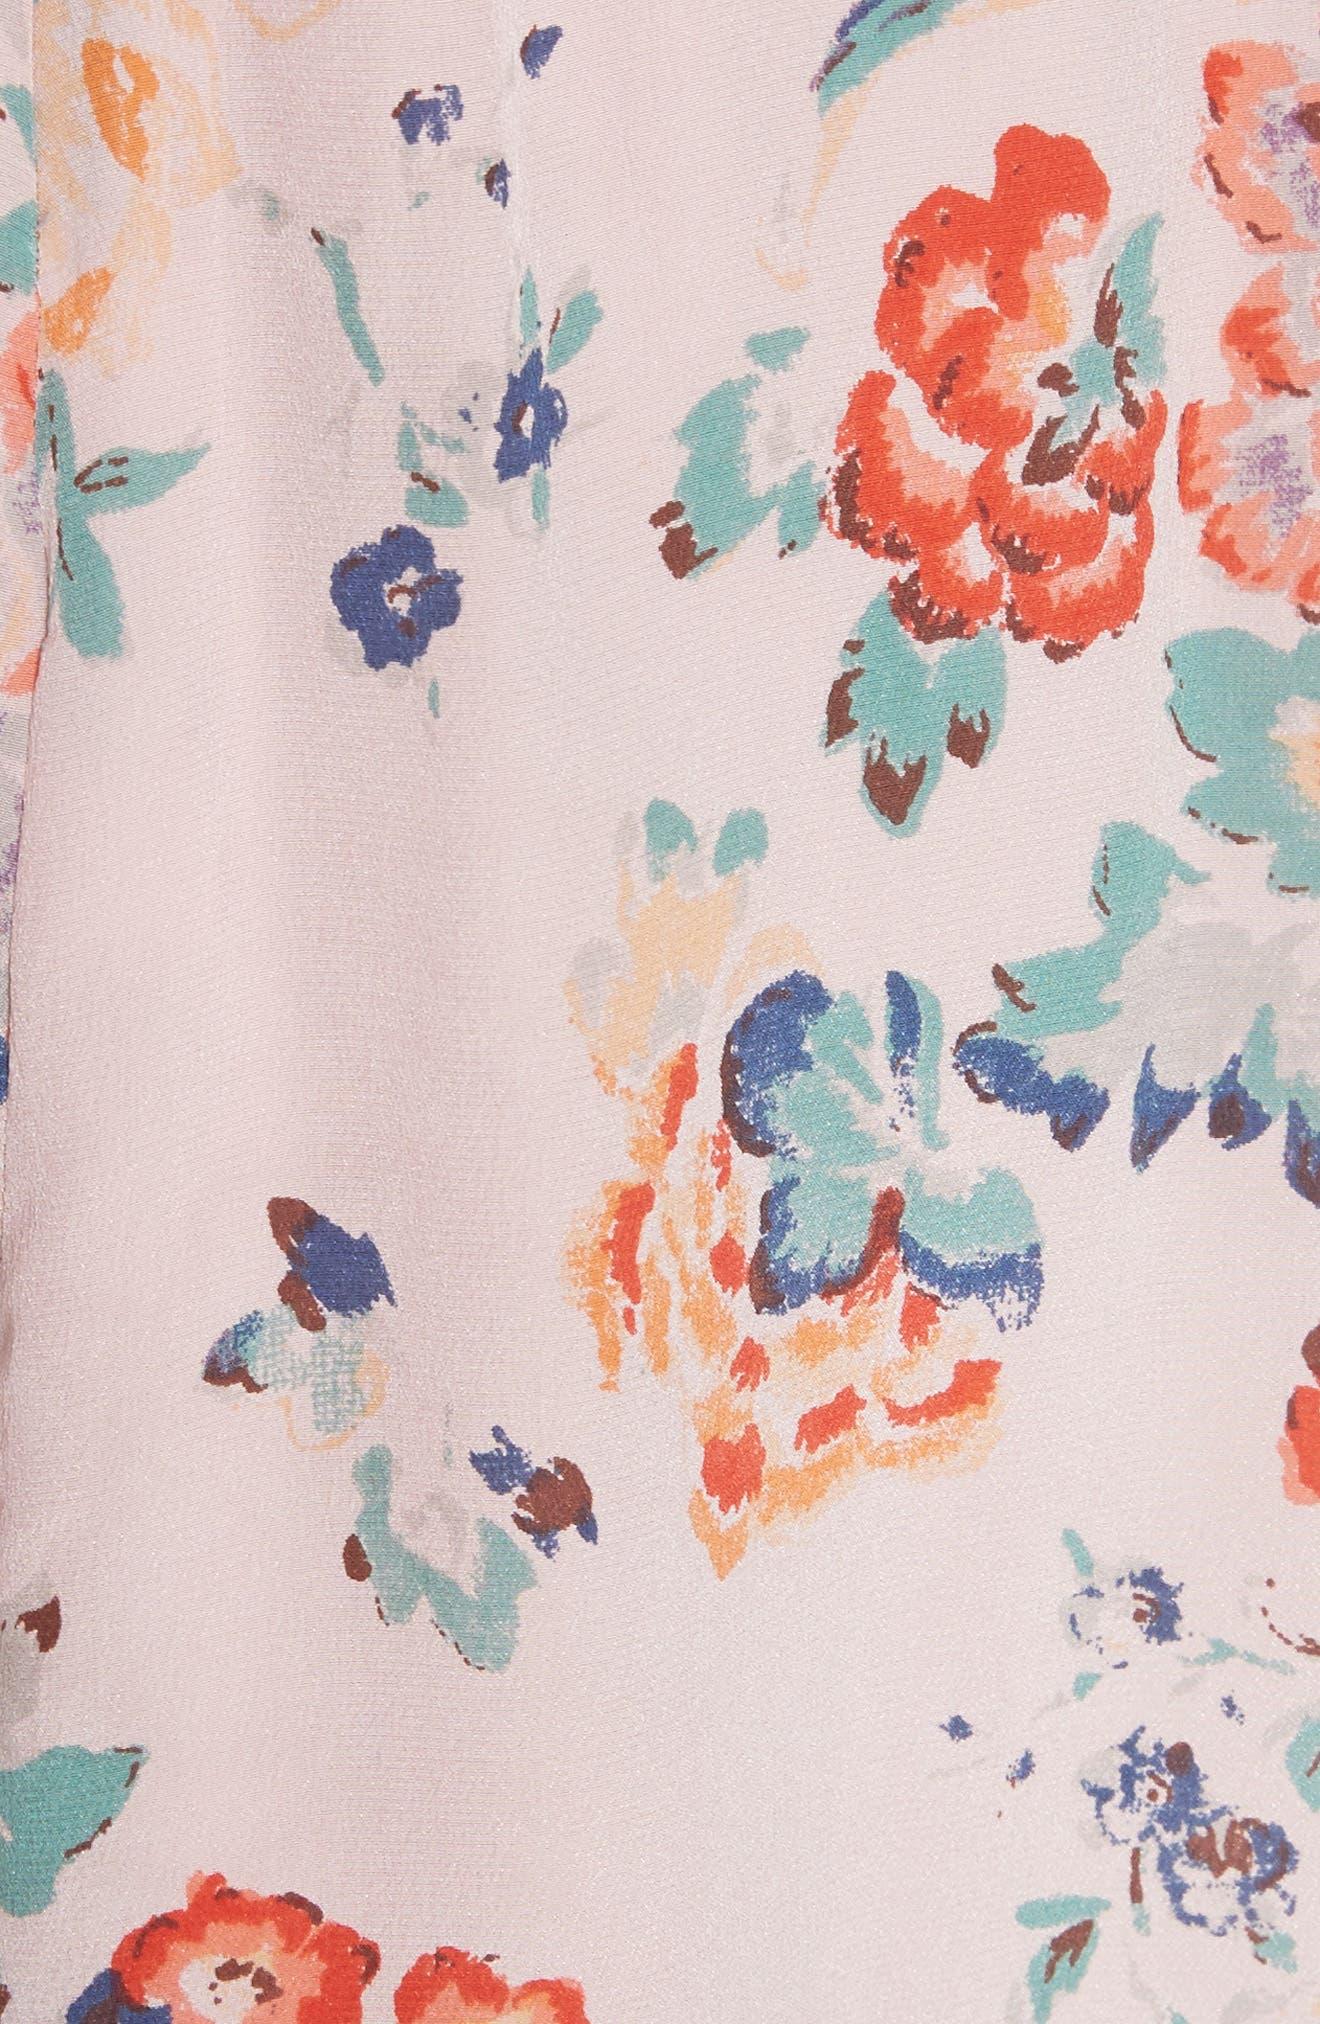 Marlena Ruffle Silk Dress,                             Alternate thumbnail 5, color,                             657